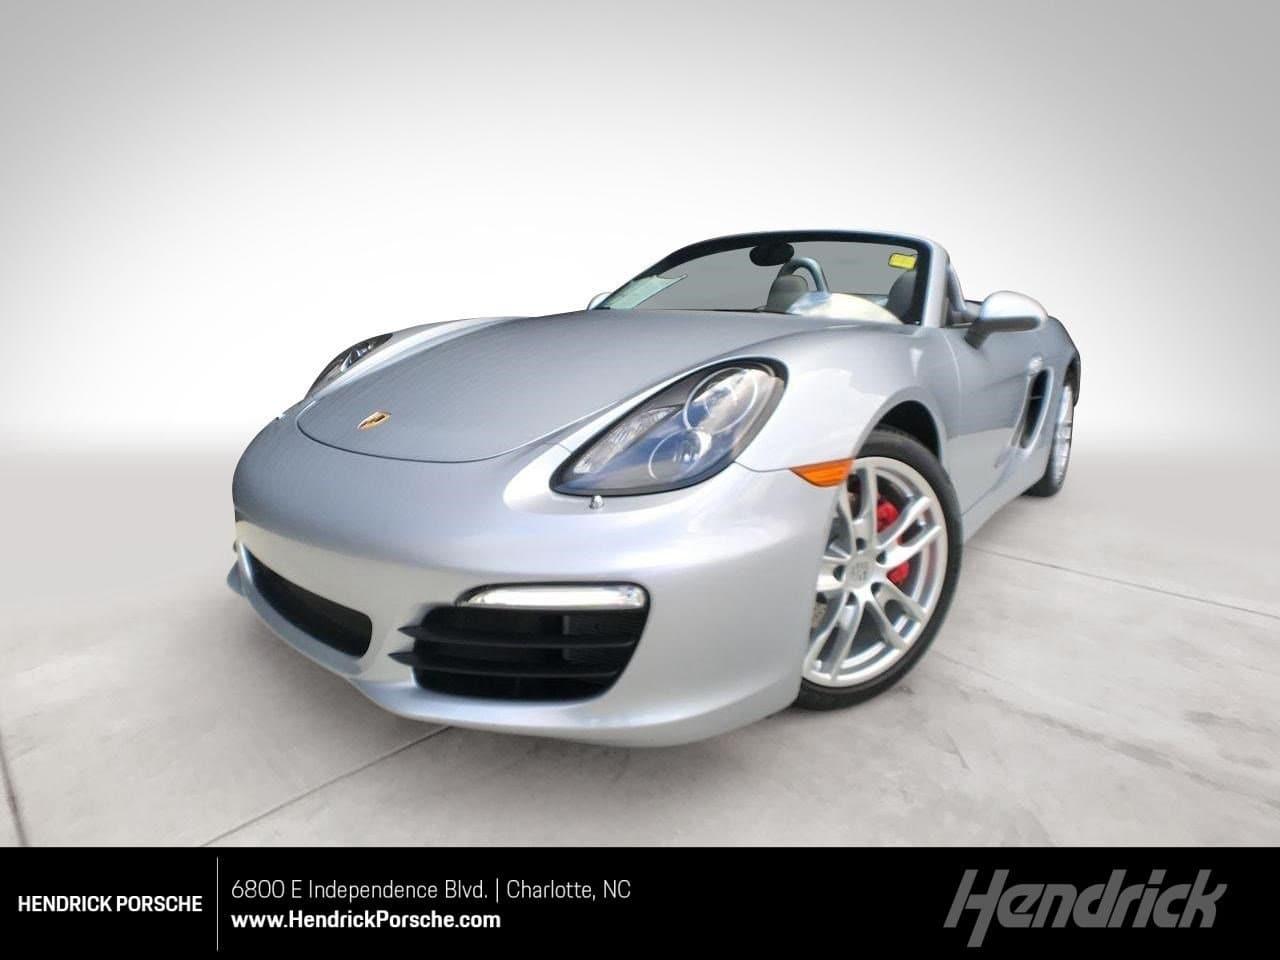 Photo 2016 Porsche Boxster S Convertible in Franklin, TN